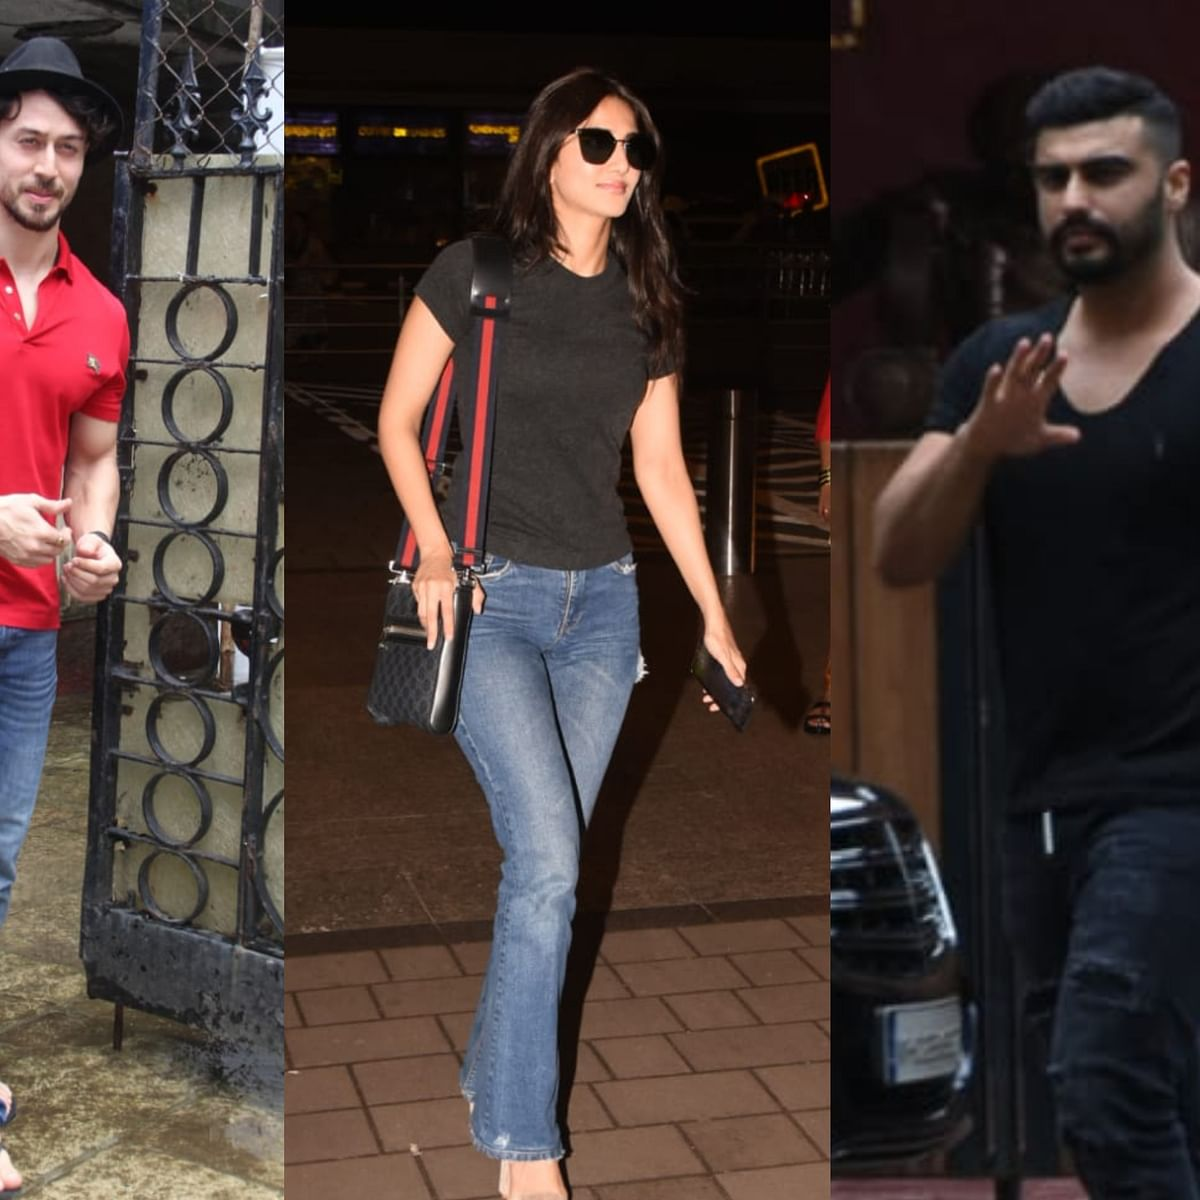 Celebrity Spotting: Arjun Kapoor, Tiger Shroff, Vaani Kapoor, and others spotted